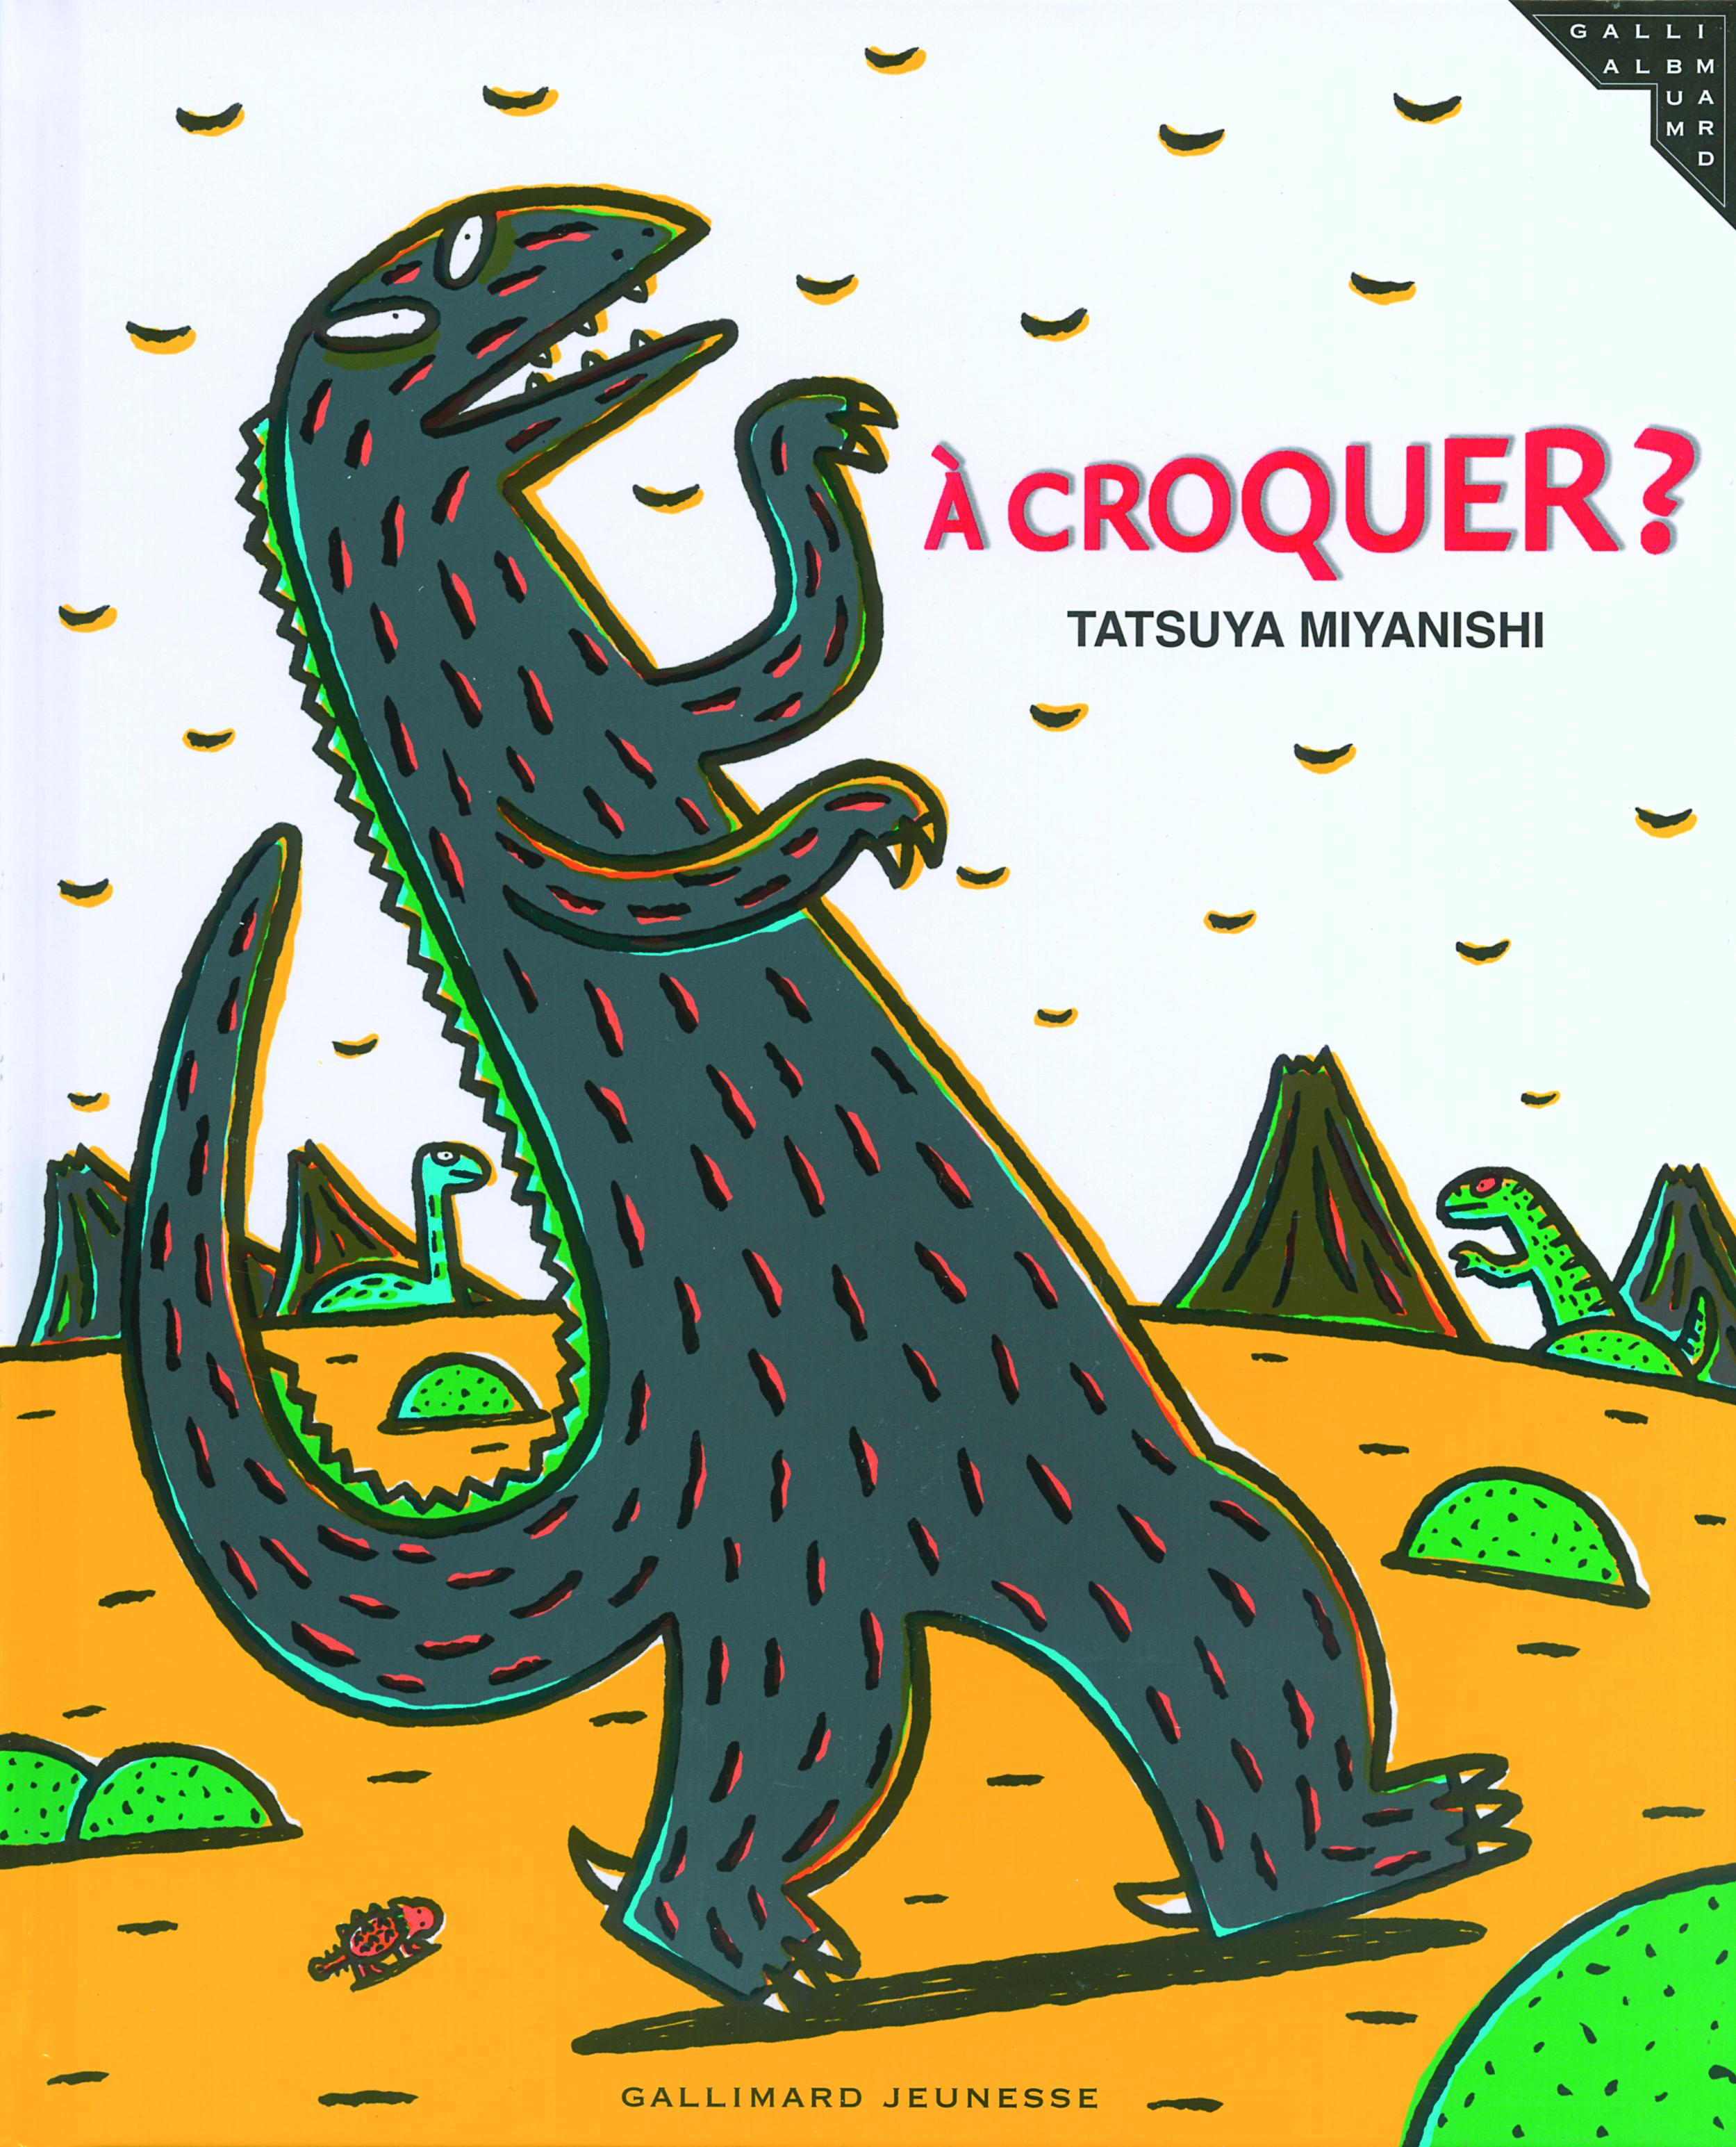 A CROQUER ?